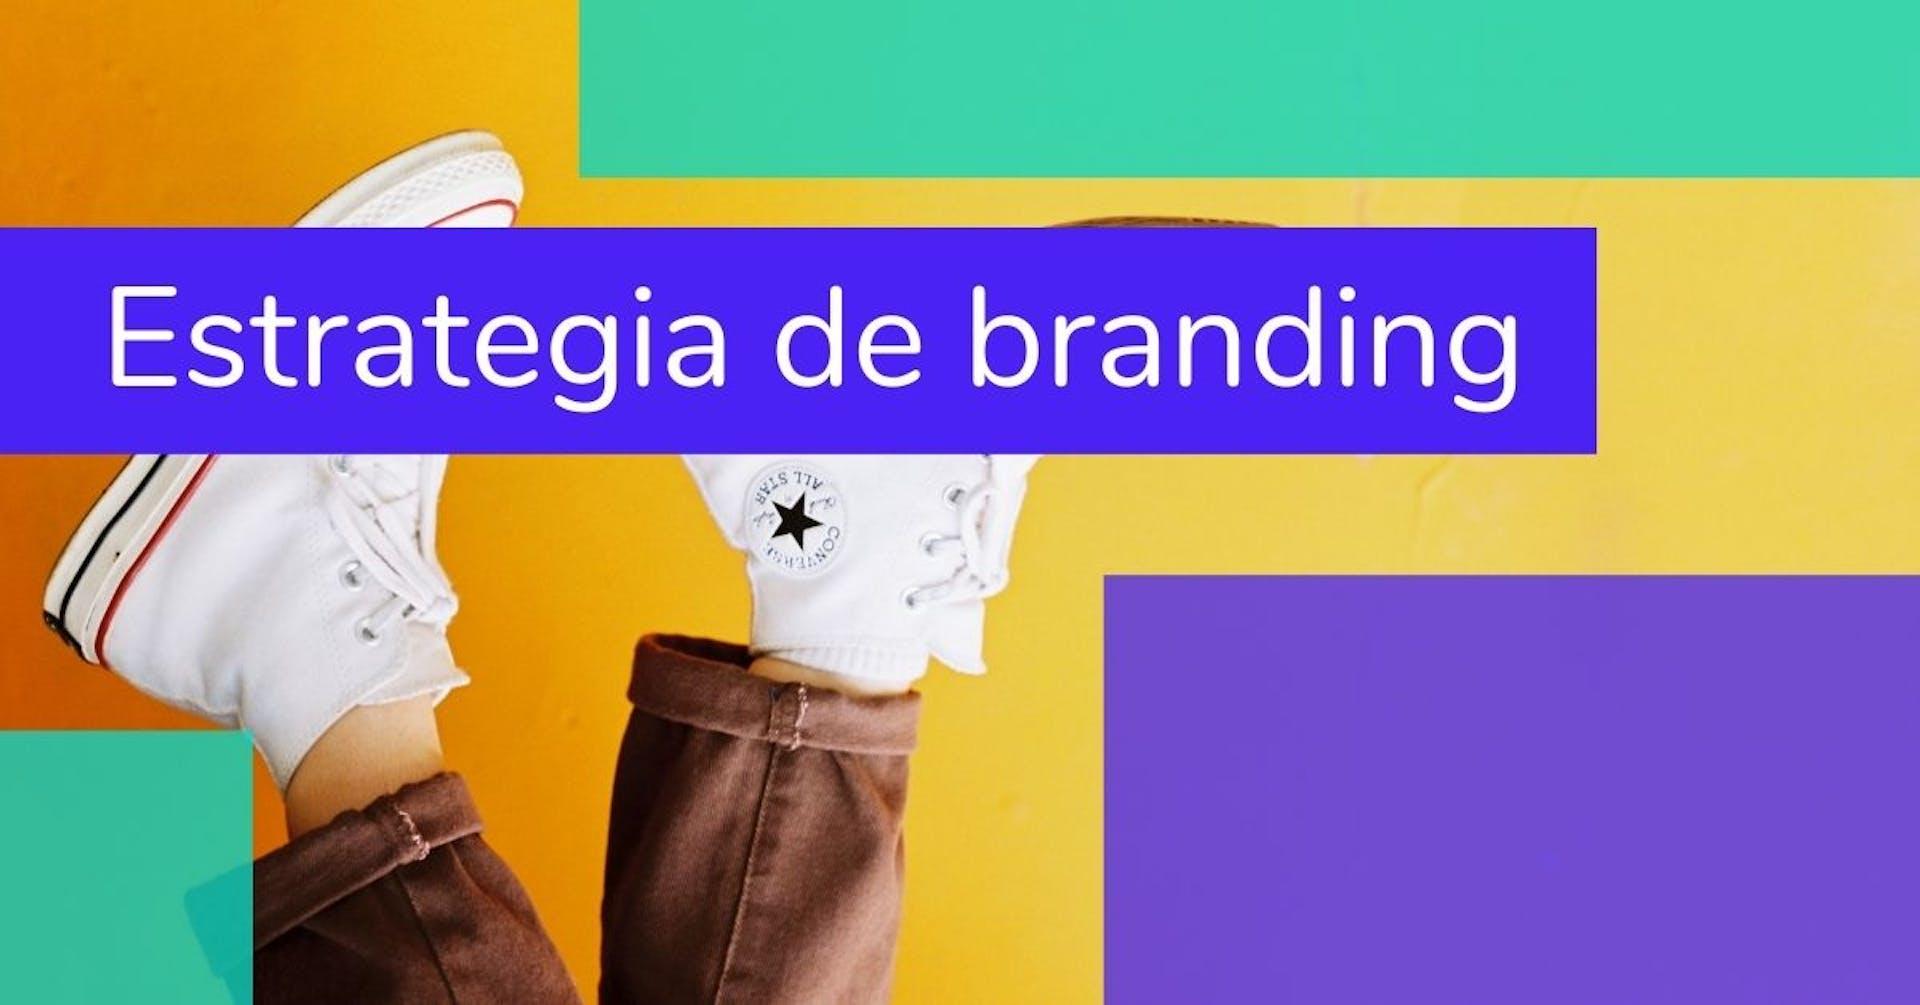 Estrategia de branding, crea una estrategia con poder